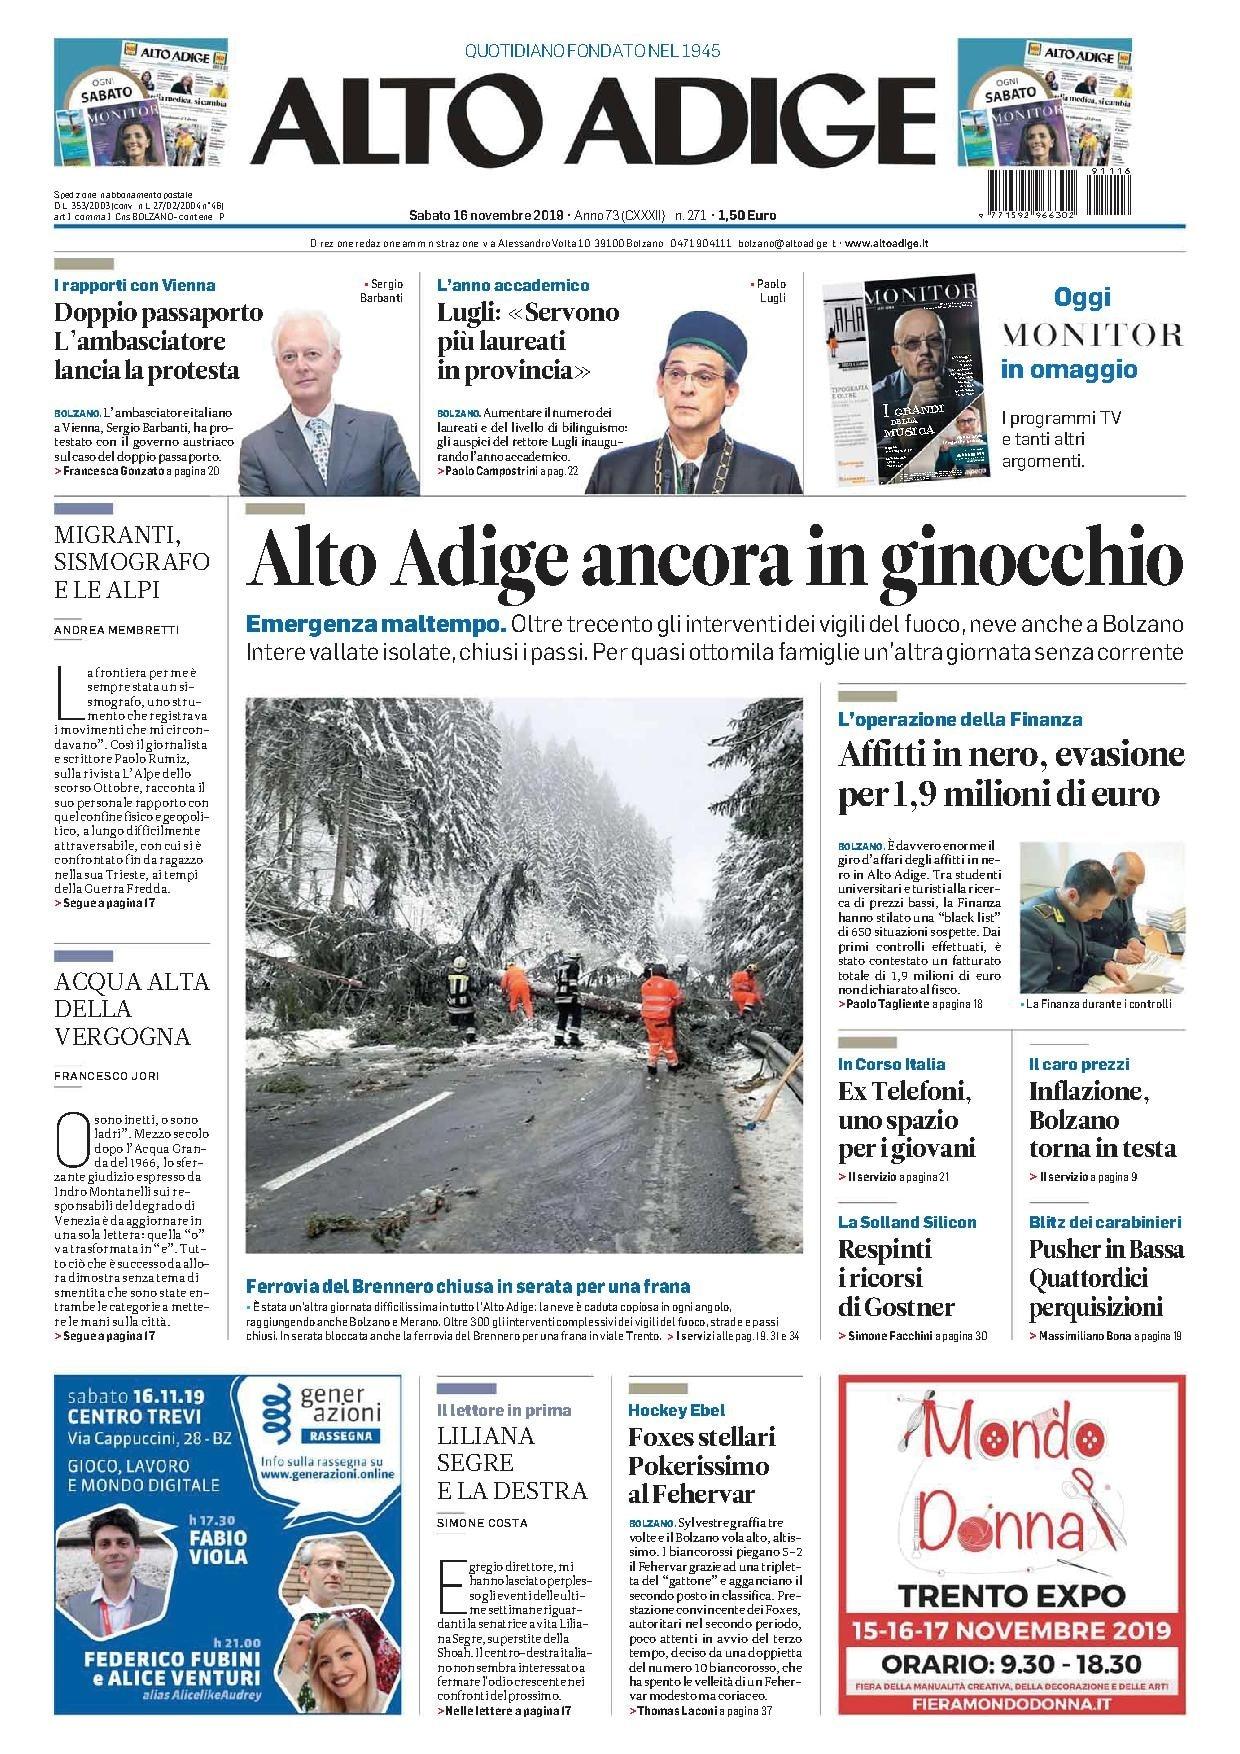 Le Prime Pagine Dei Quotidiani In Edicola Oggi In Alto Adige Media Tgr Bolzano